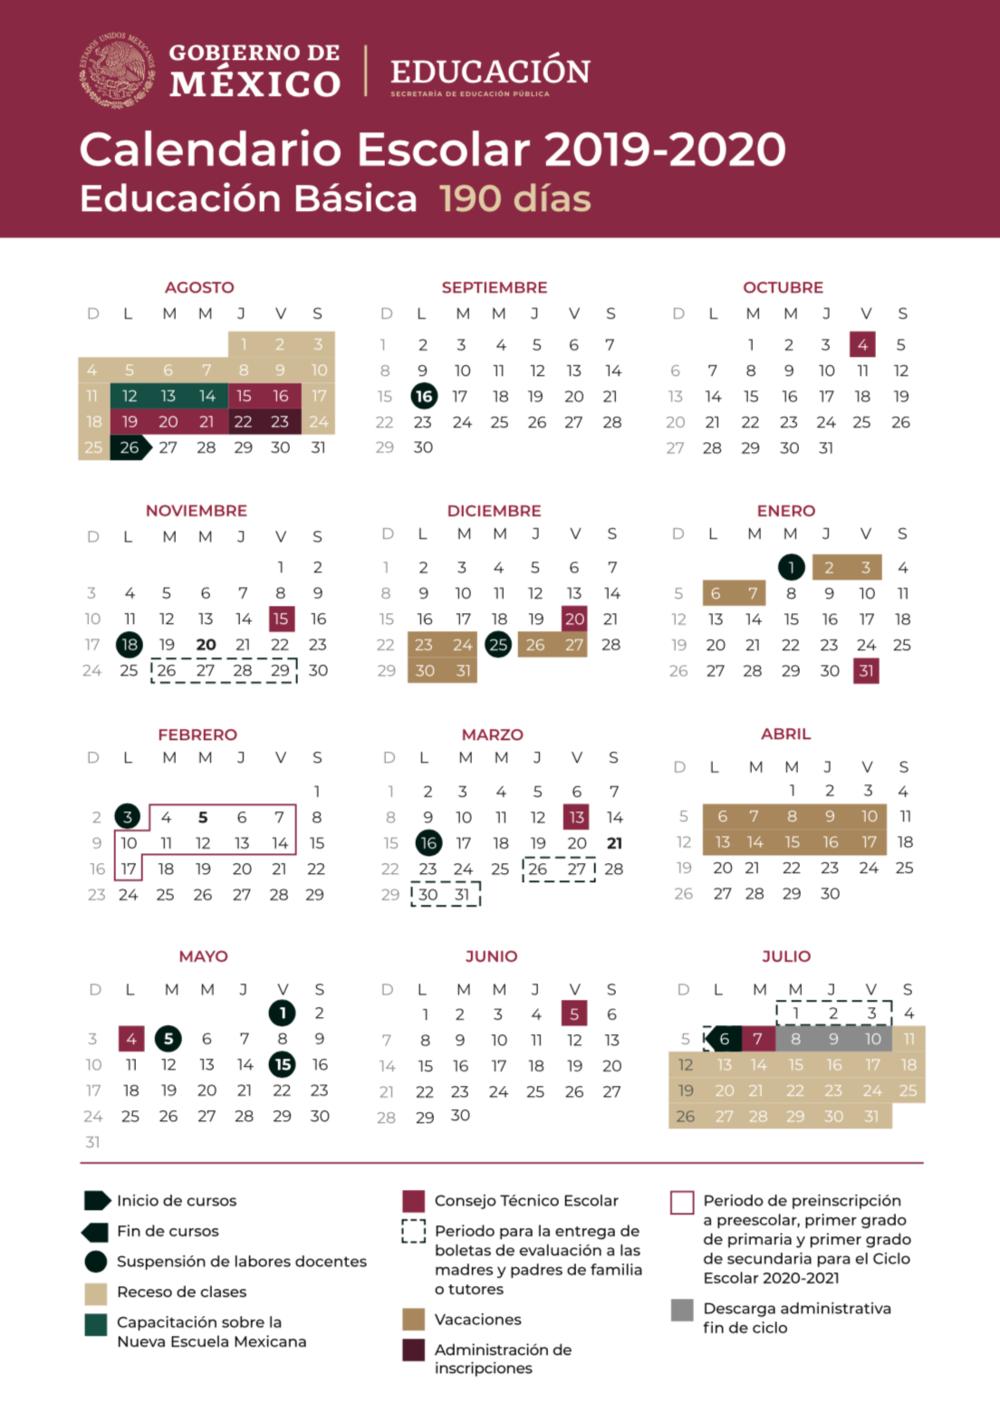 Costa Verde International School in Sep Calendario 2020